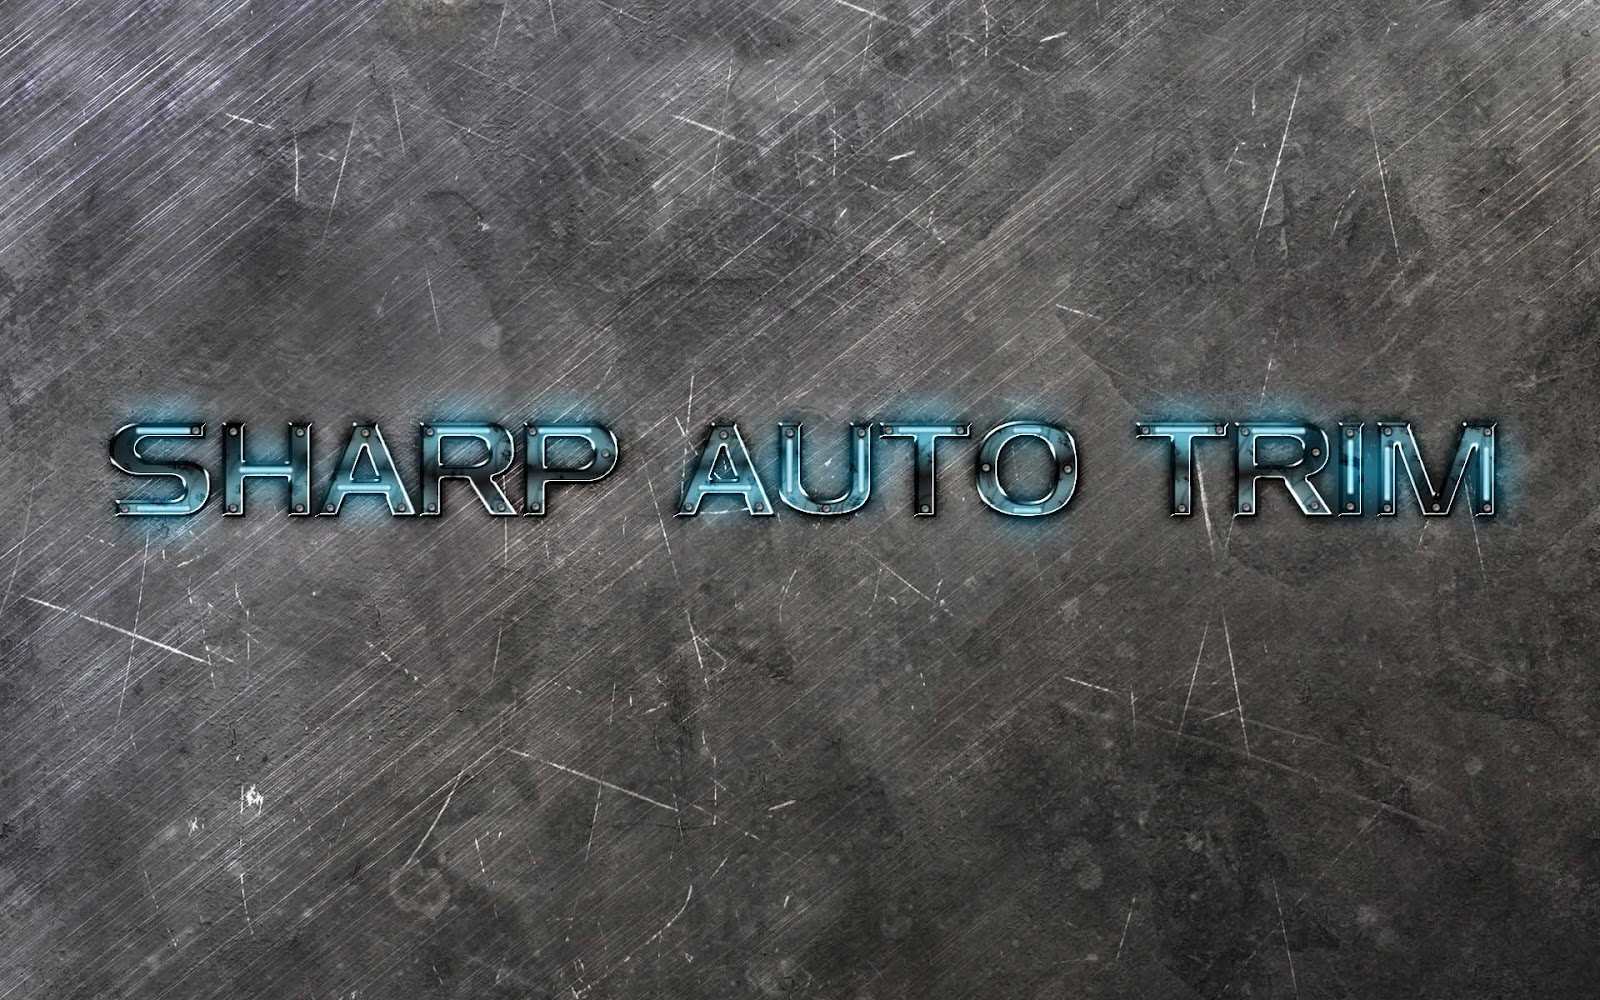 http://2.bp.blogspot.com/-kVtzTCtG7CA/T6aXN552uoI/AAAAAAAAADM/0C0j9M9AQBM/s1600/sharp+auto+trim.jpg